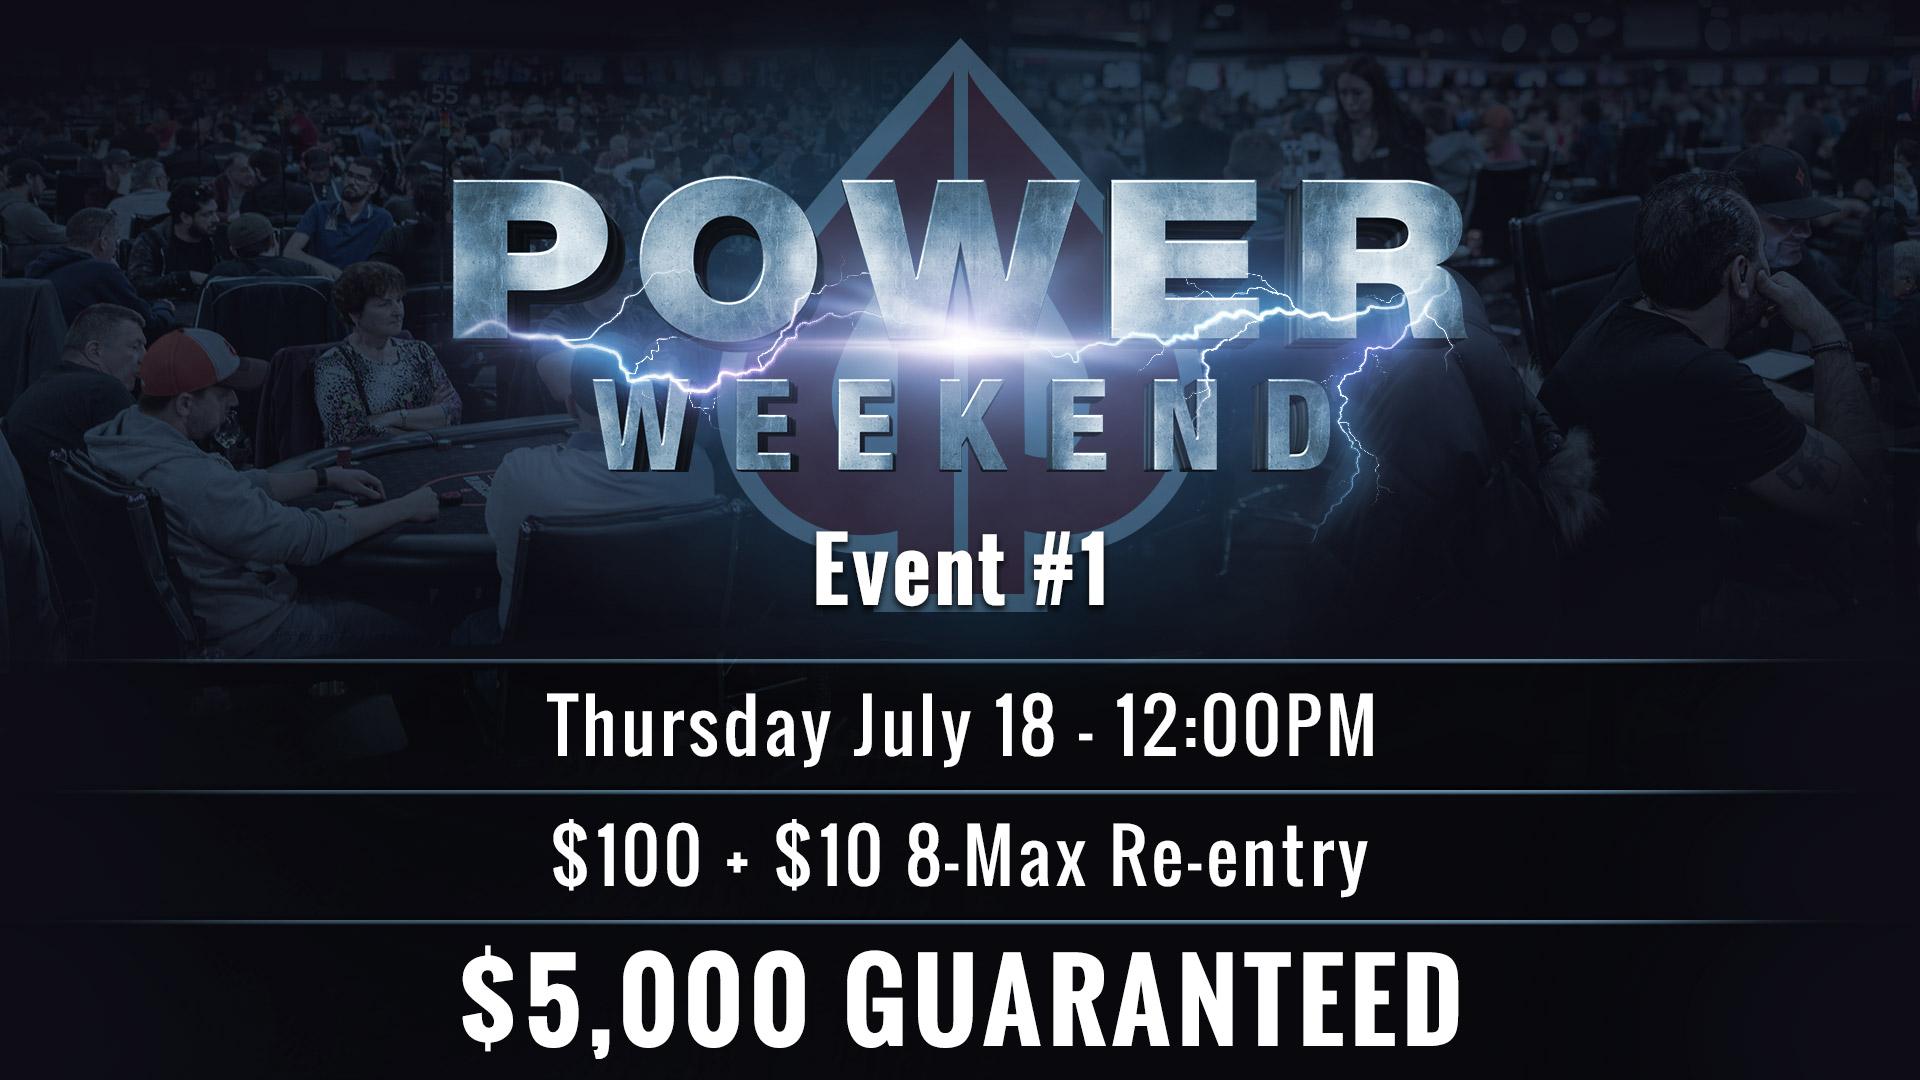 Event #1 Info